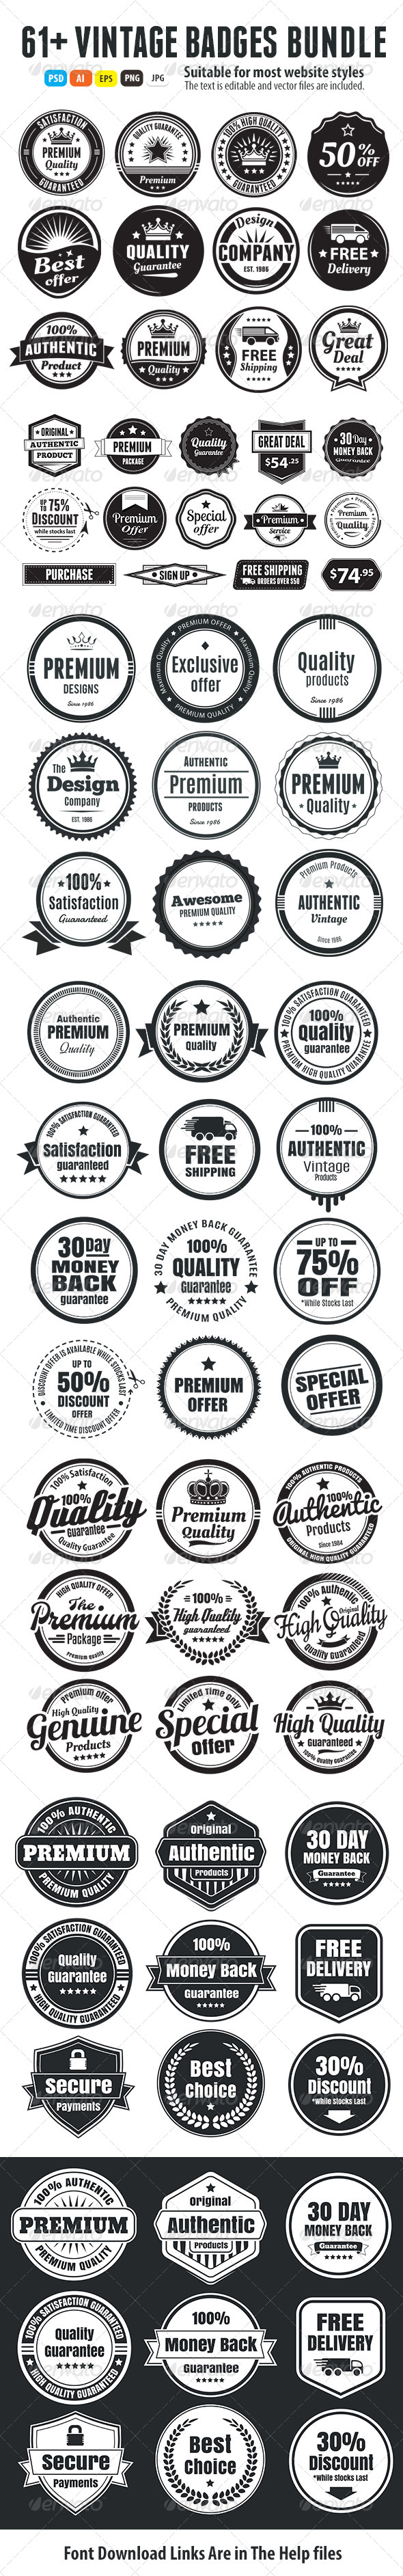 61+ Vintage Badges Bundle - Badges & Stickers Web Elements